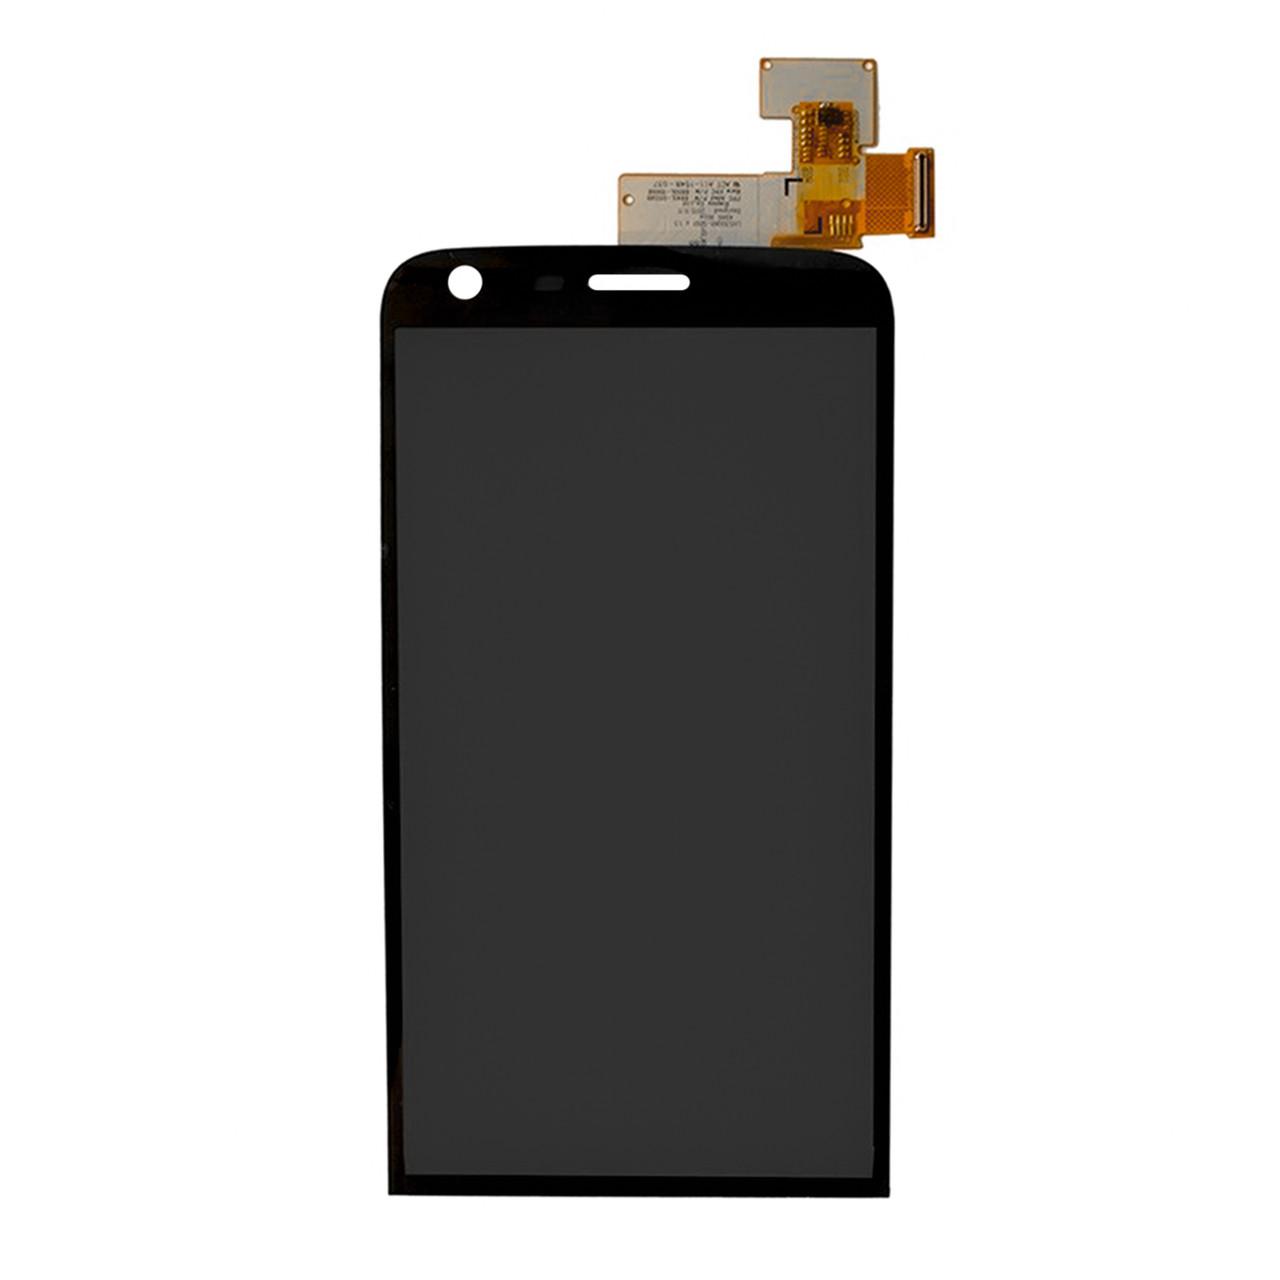 Дисплей LG G5 H845 в сборе Black (32)